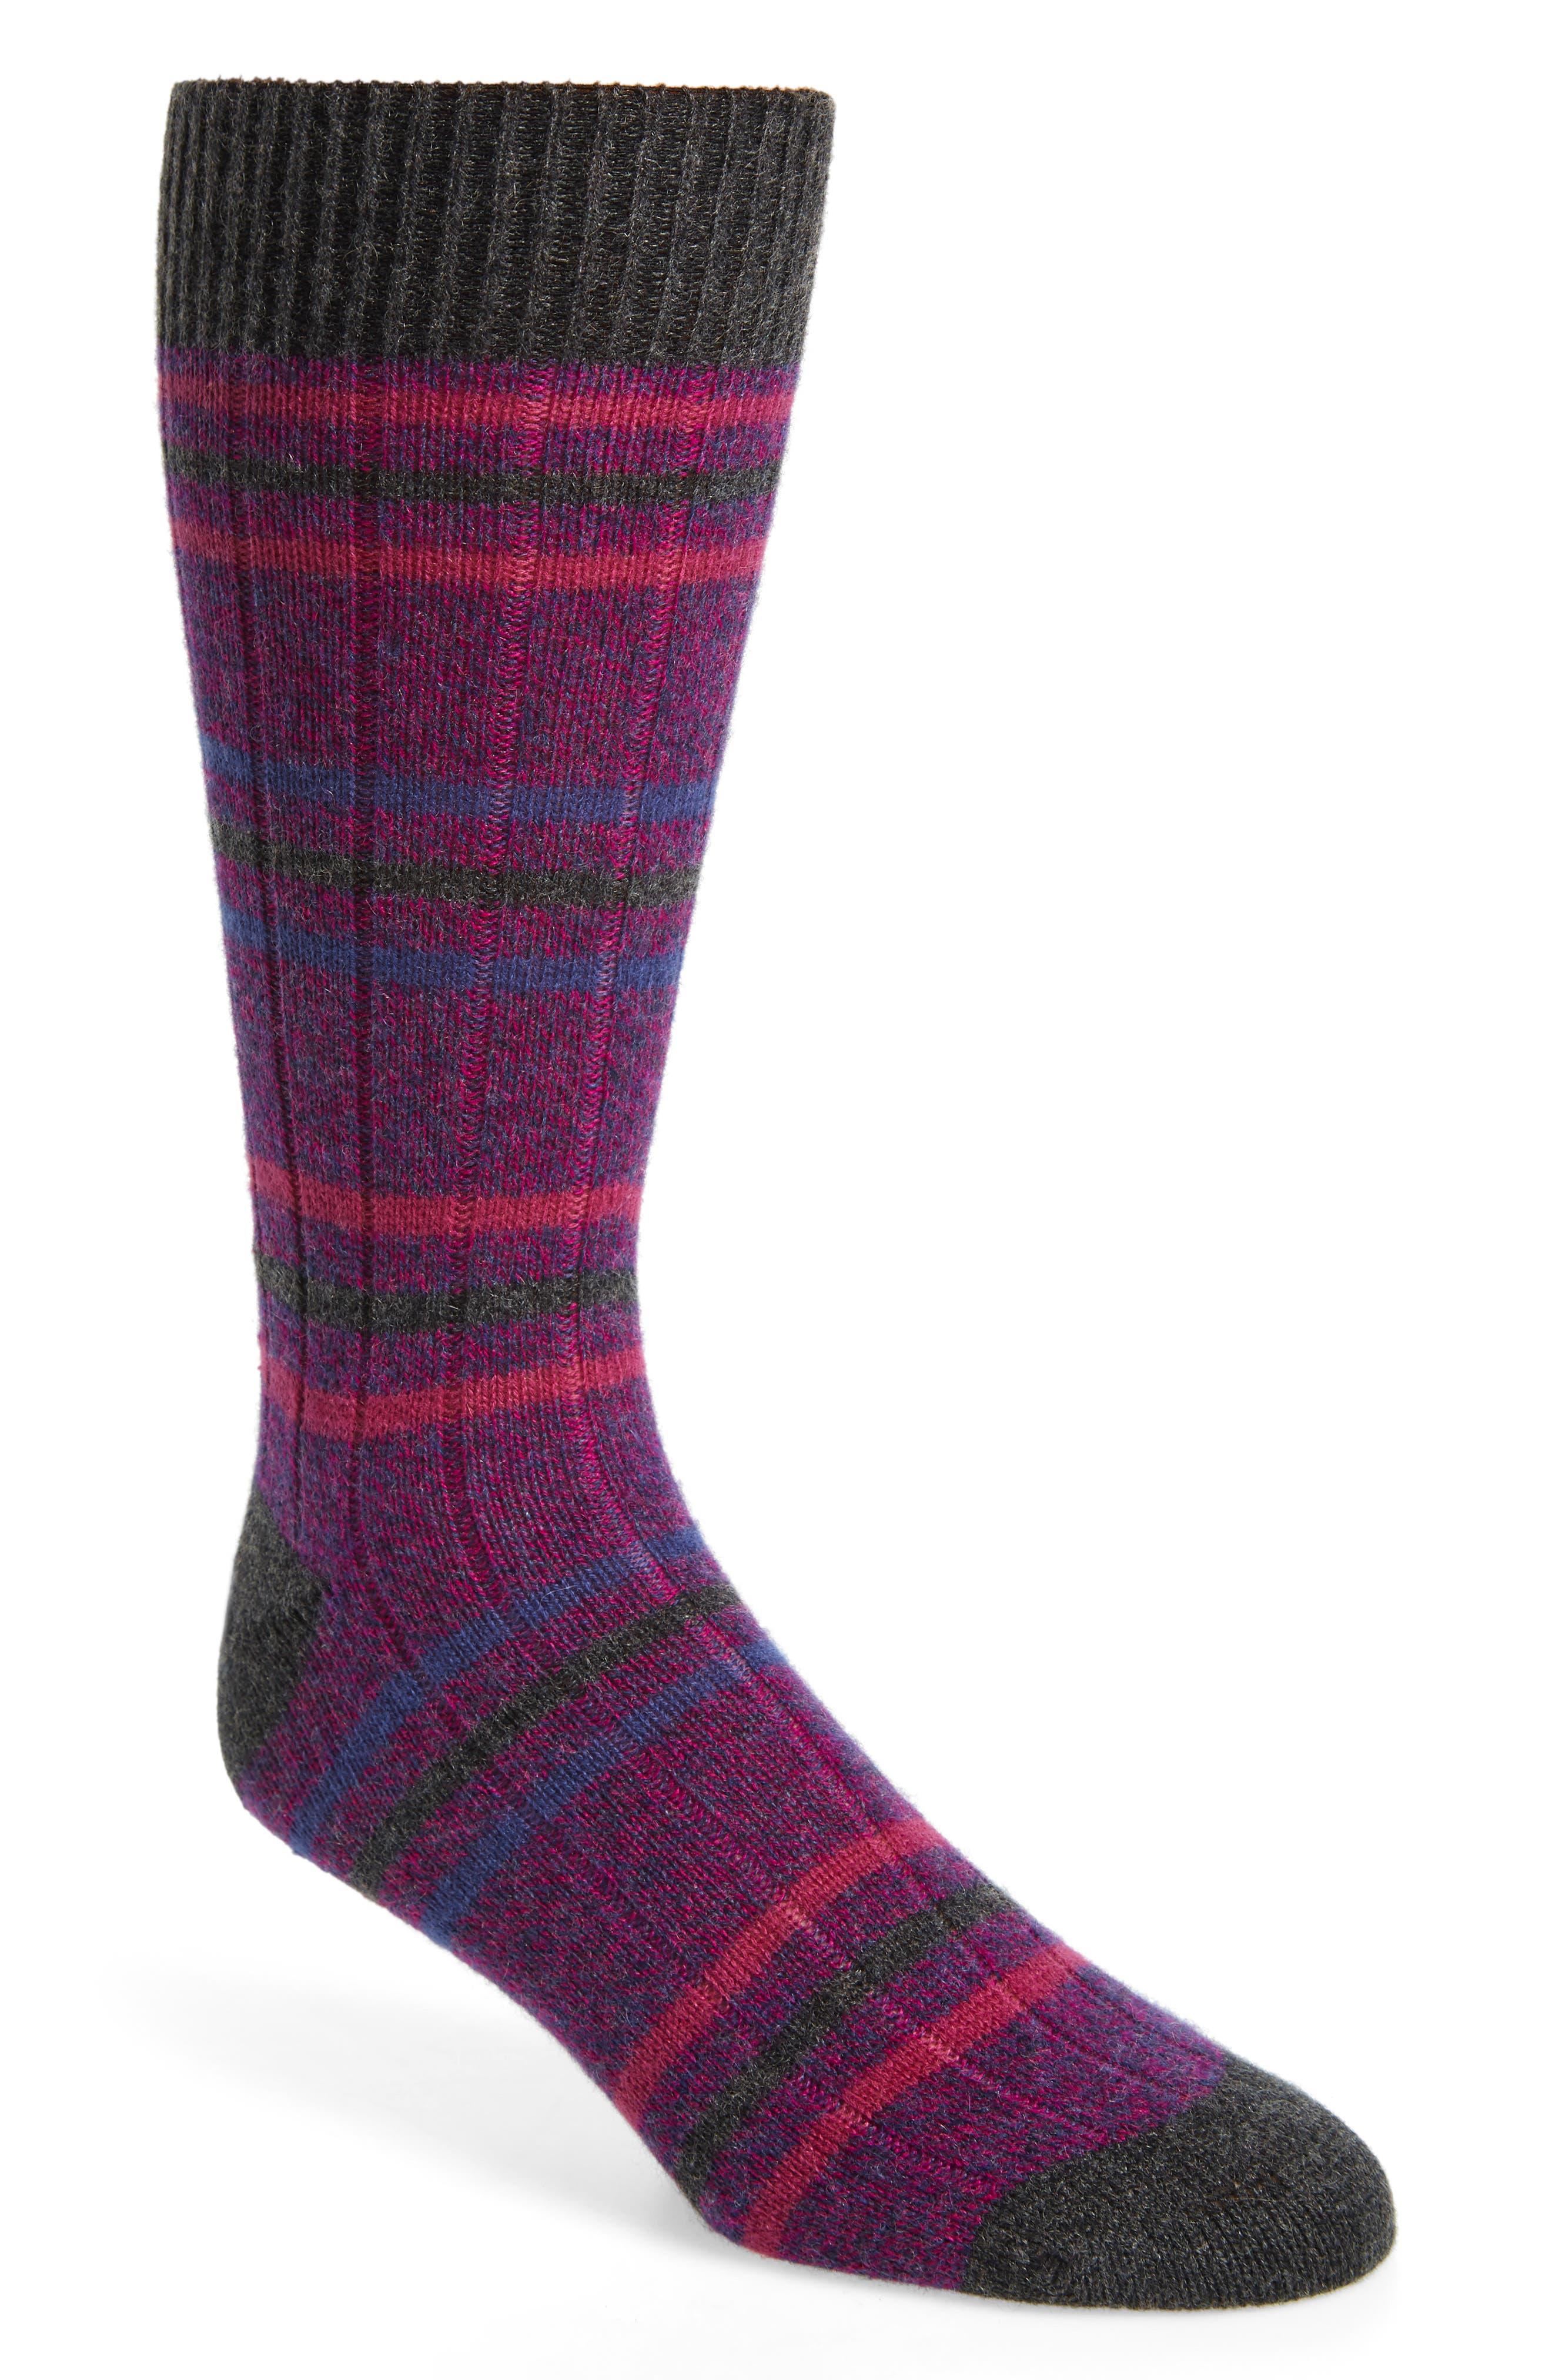 PANTHERELLA Stripe Cashmere Blend Socks in Magenta Denim